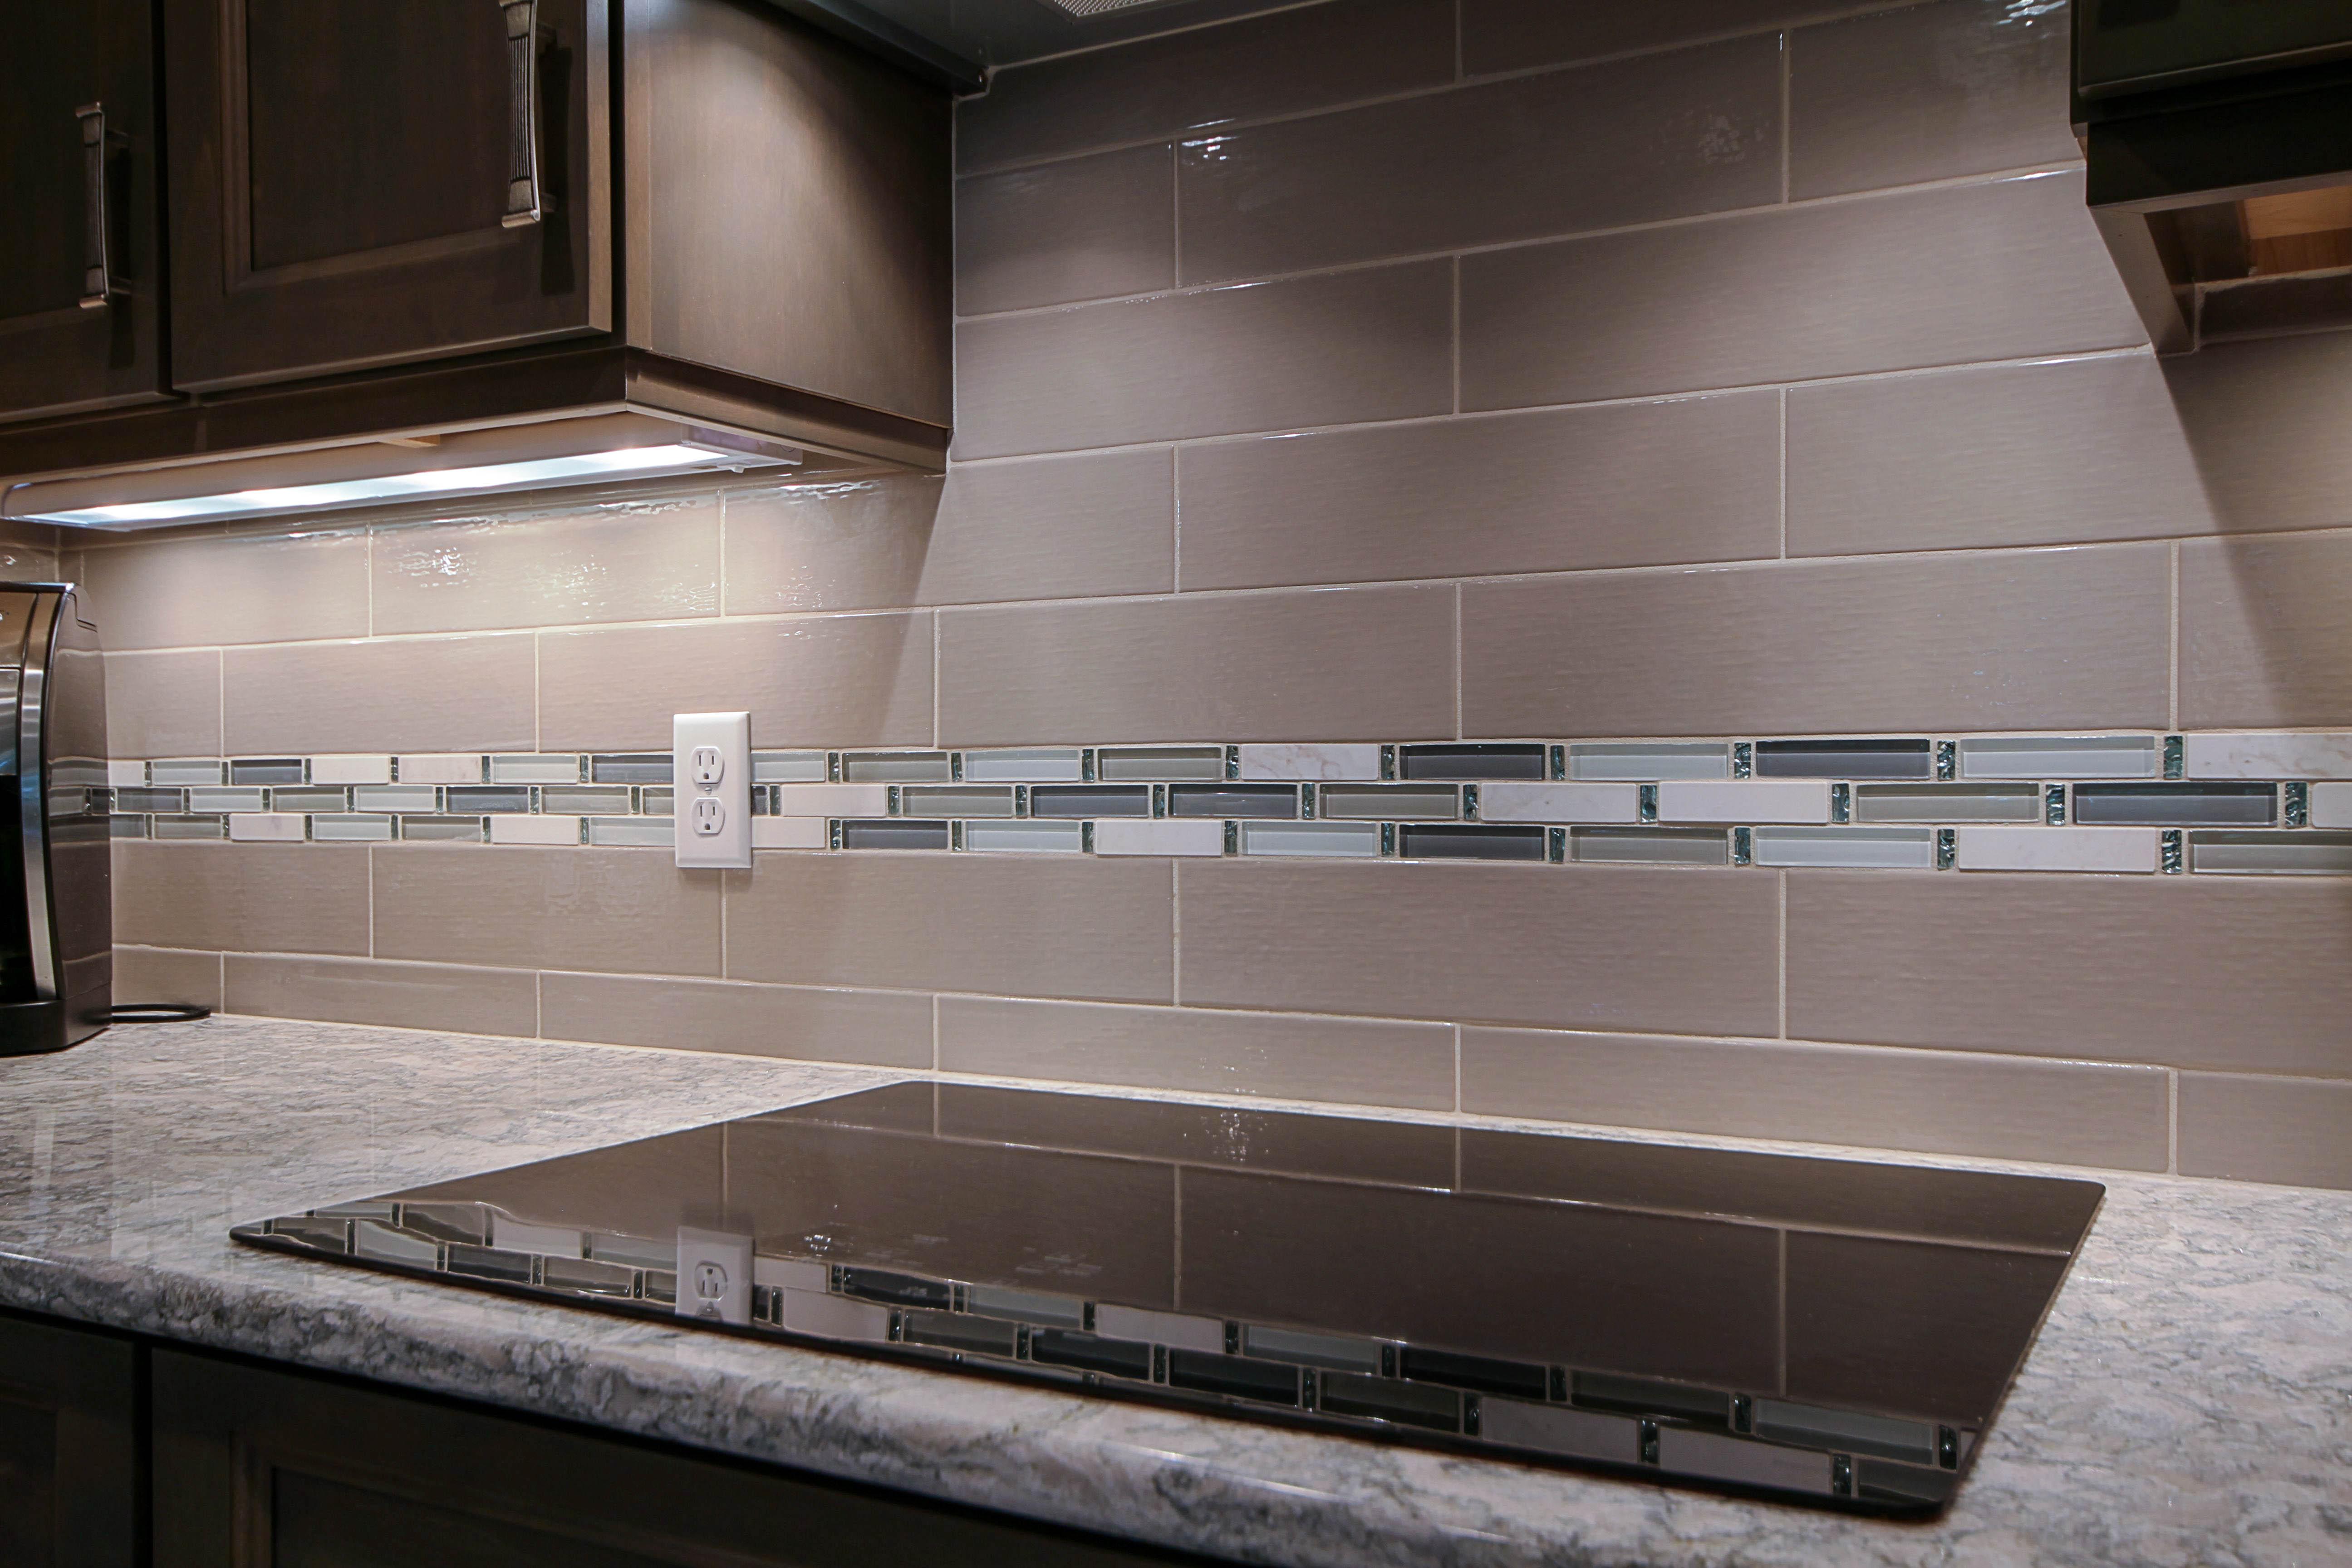 Kitchen Remodeling, grey subway kitchen backsplash, glass accent tile